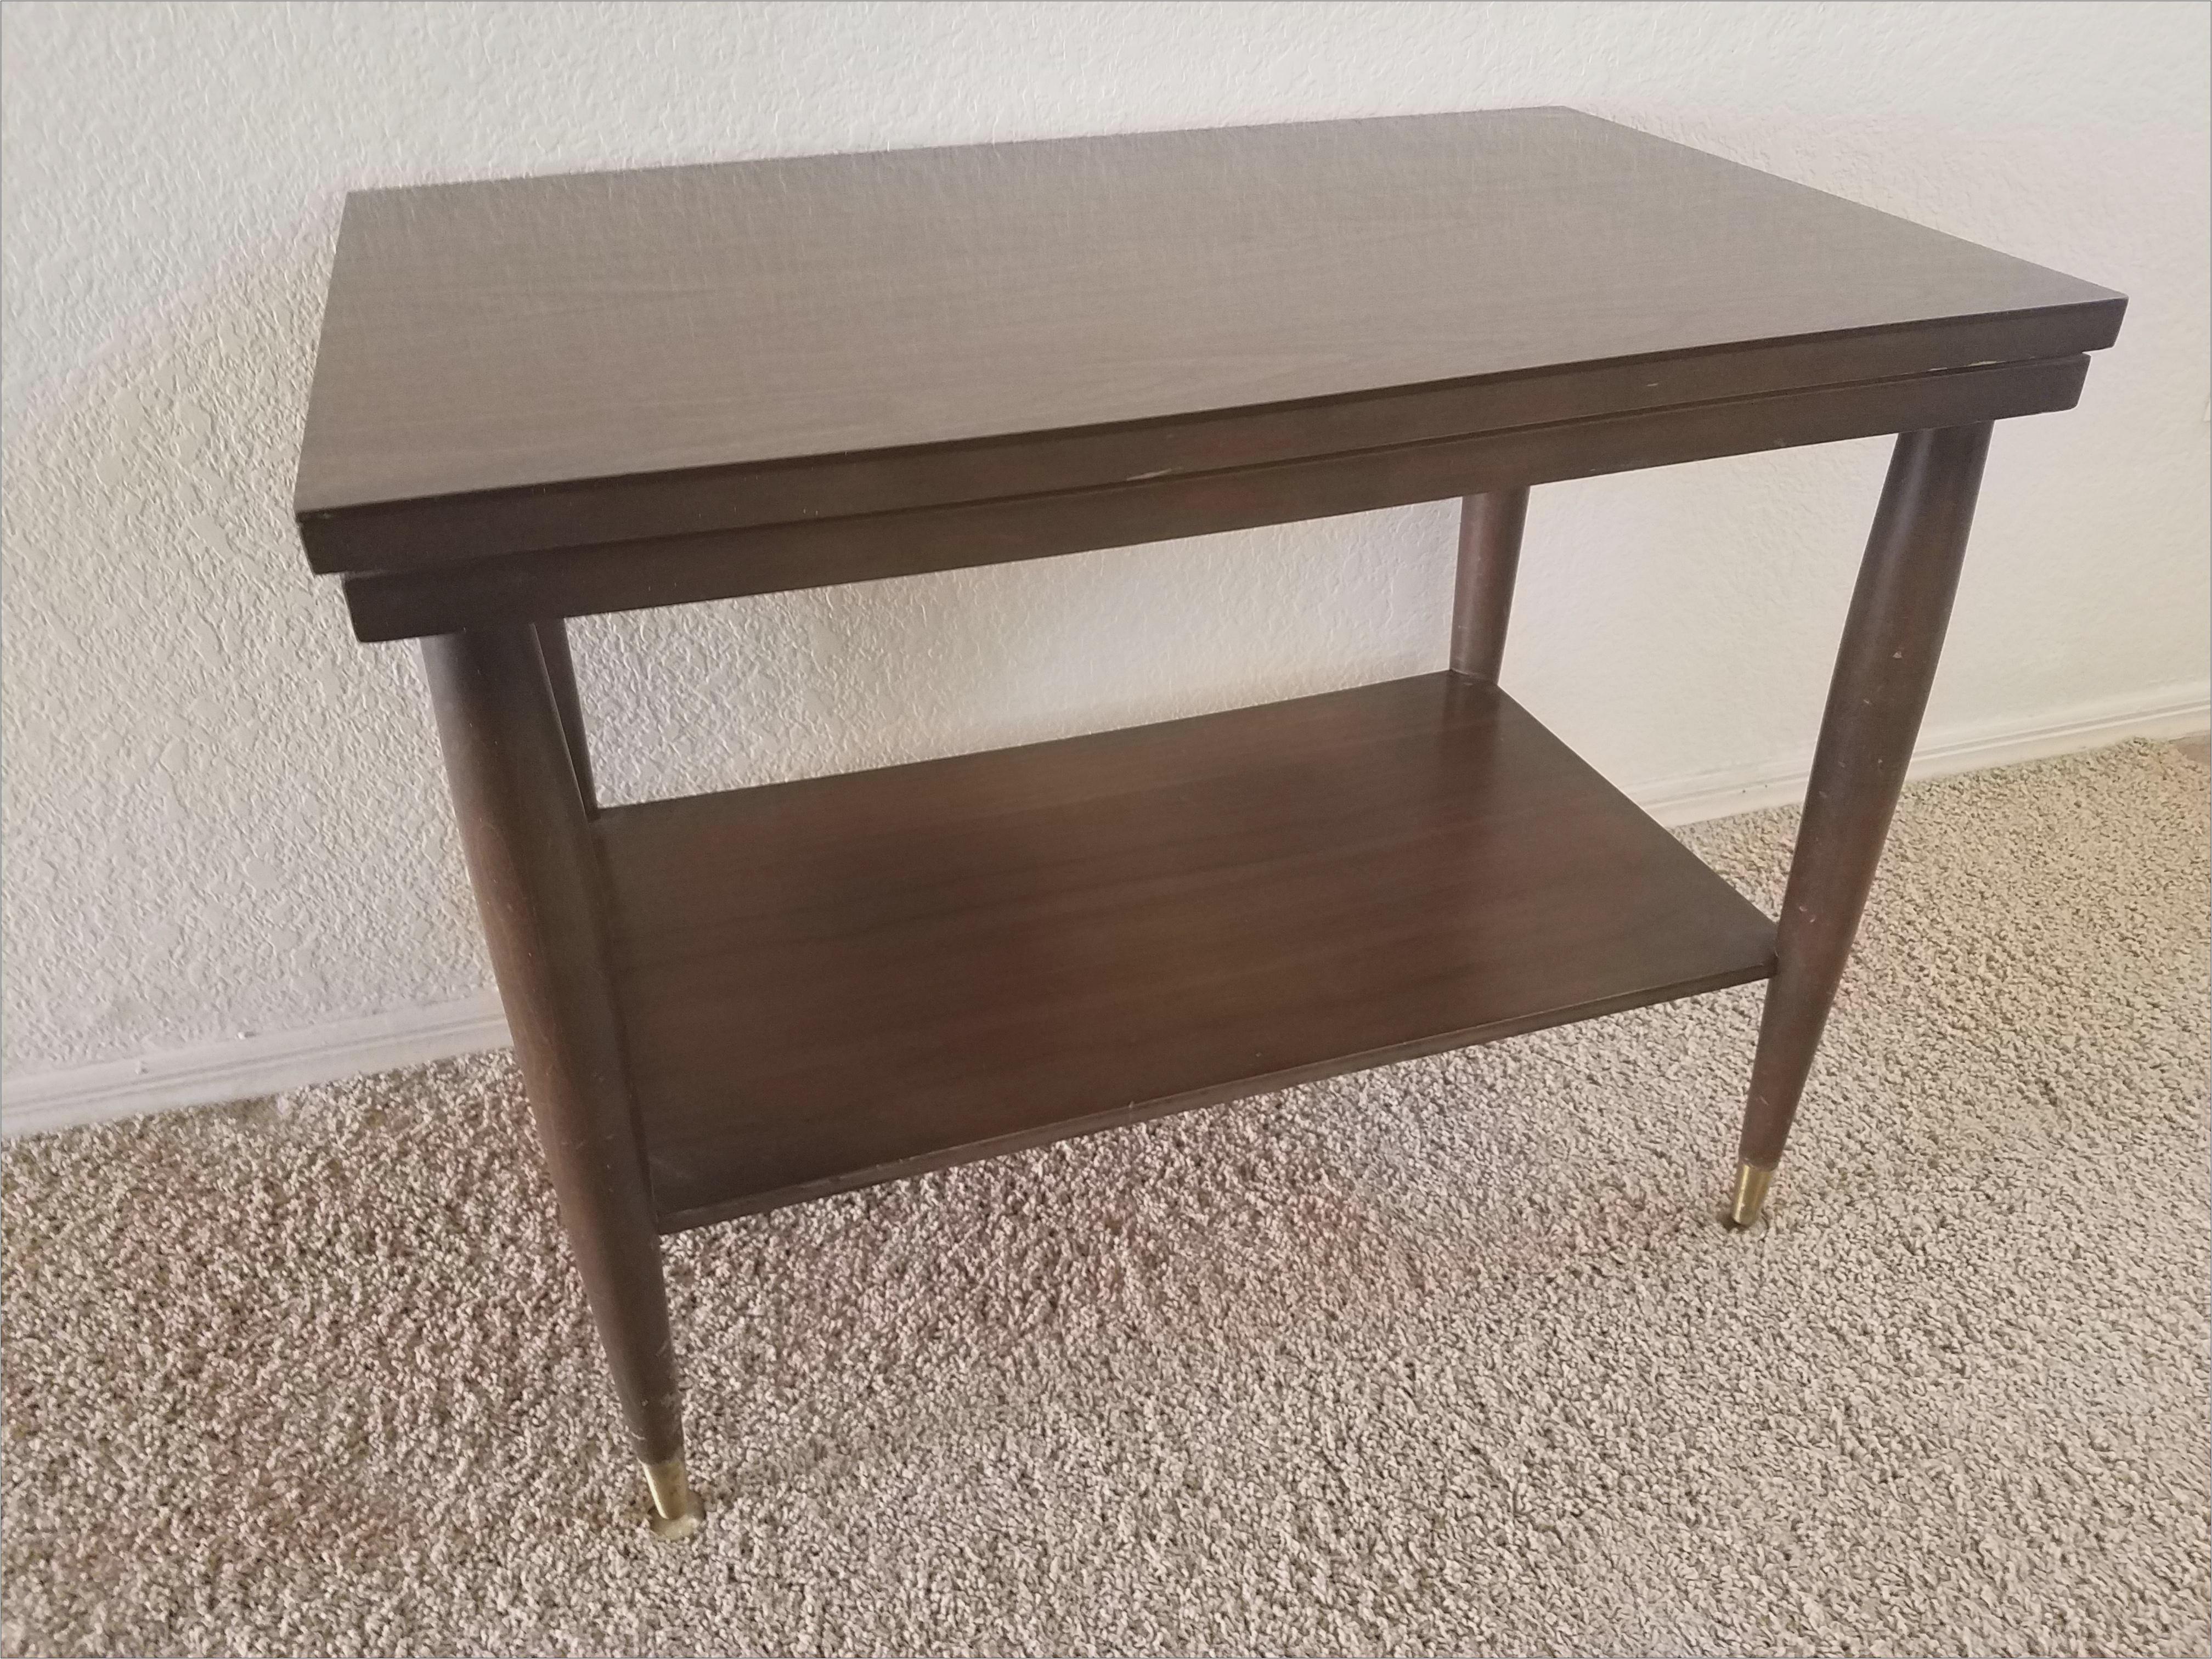 unique homemade coffee table ideas beautiful build outdoor table of unique homemade coffee table ideas Unique